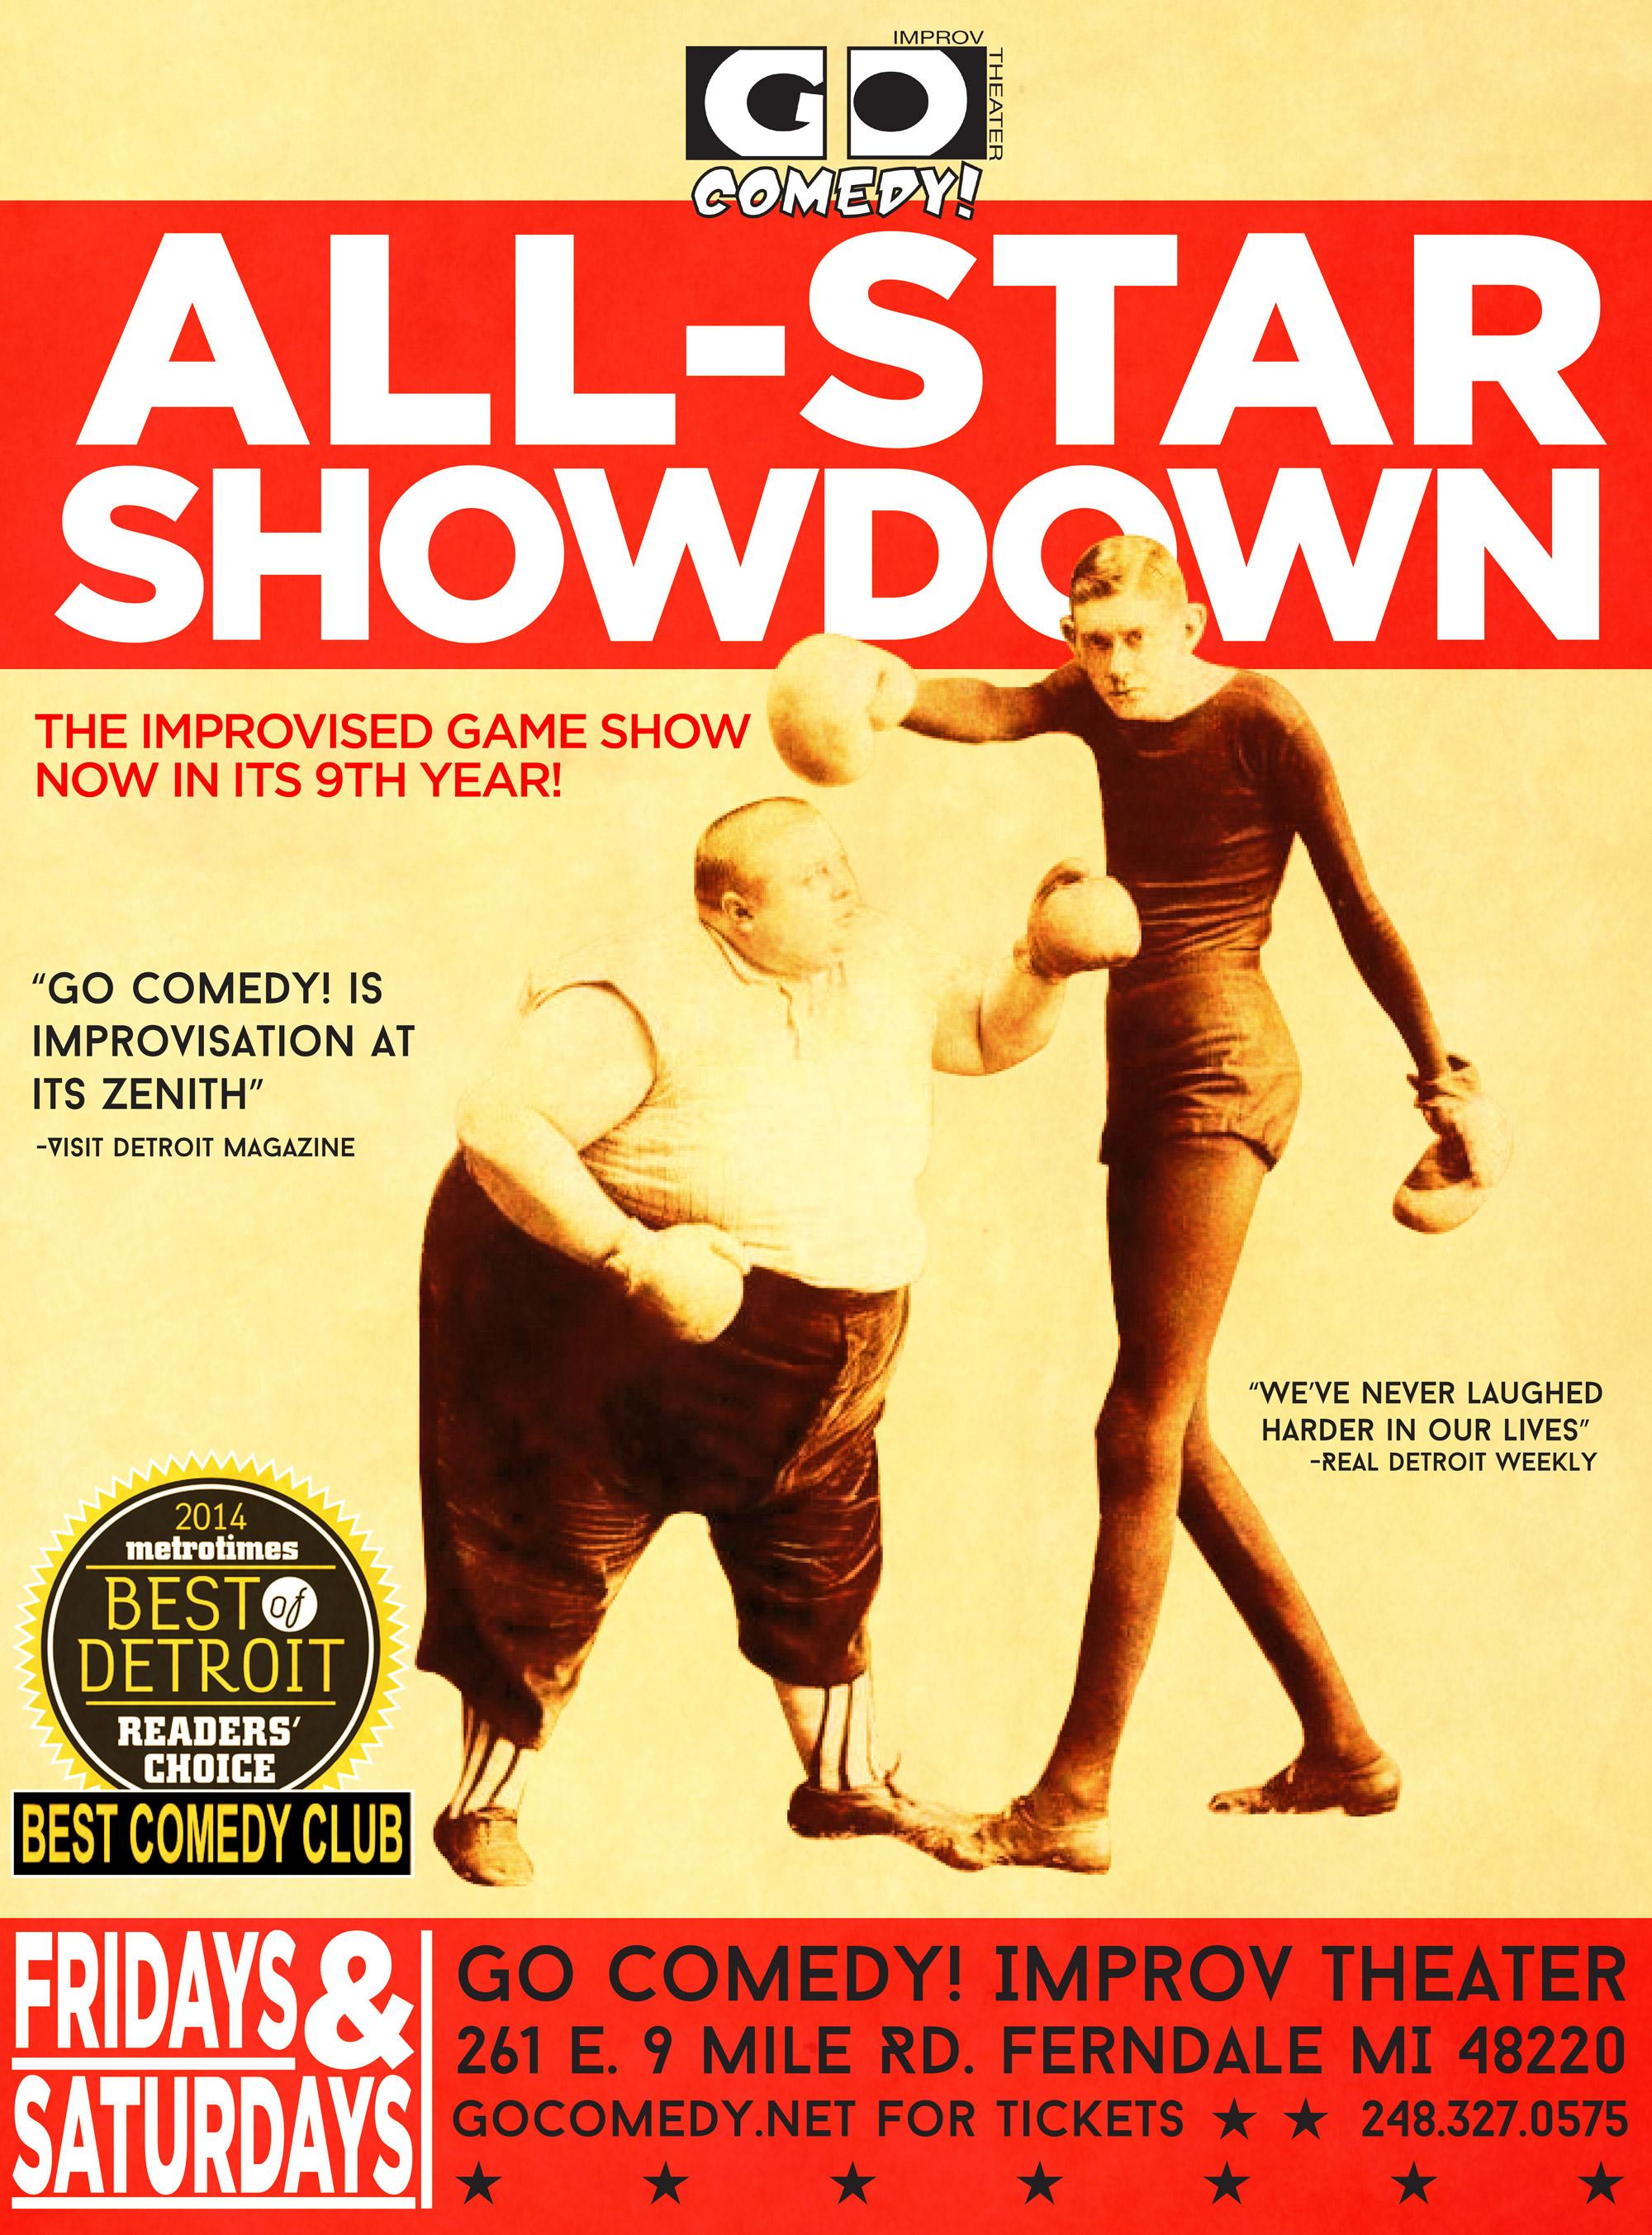 Allstar-ShowdownFINAL-SM.jpg